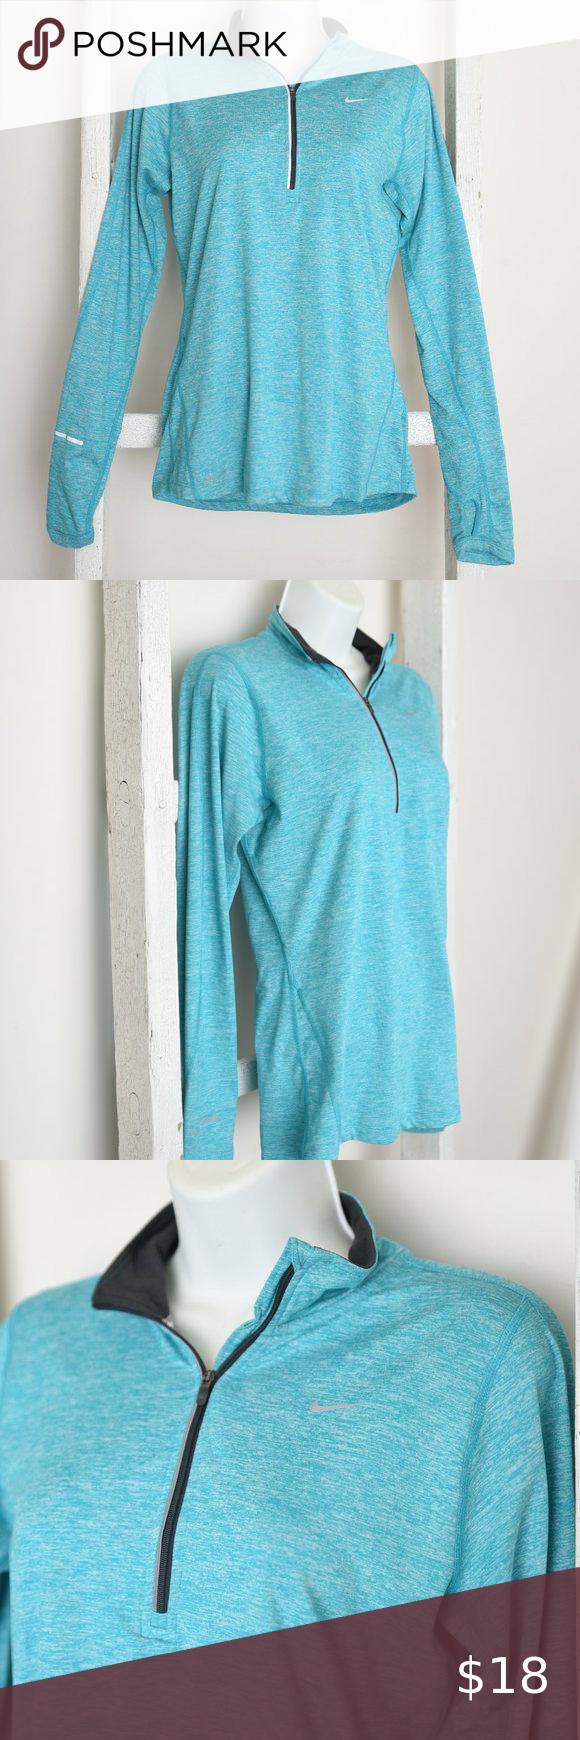 Women S Aqua 1 4 Zip Nike Pull Over Long Sleeve Clothes Design Sleeves Women [ 1740 x 580 Pixel ]